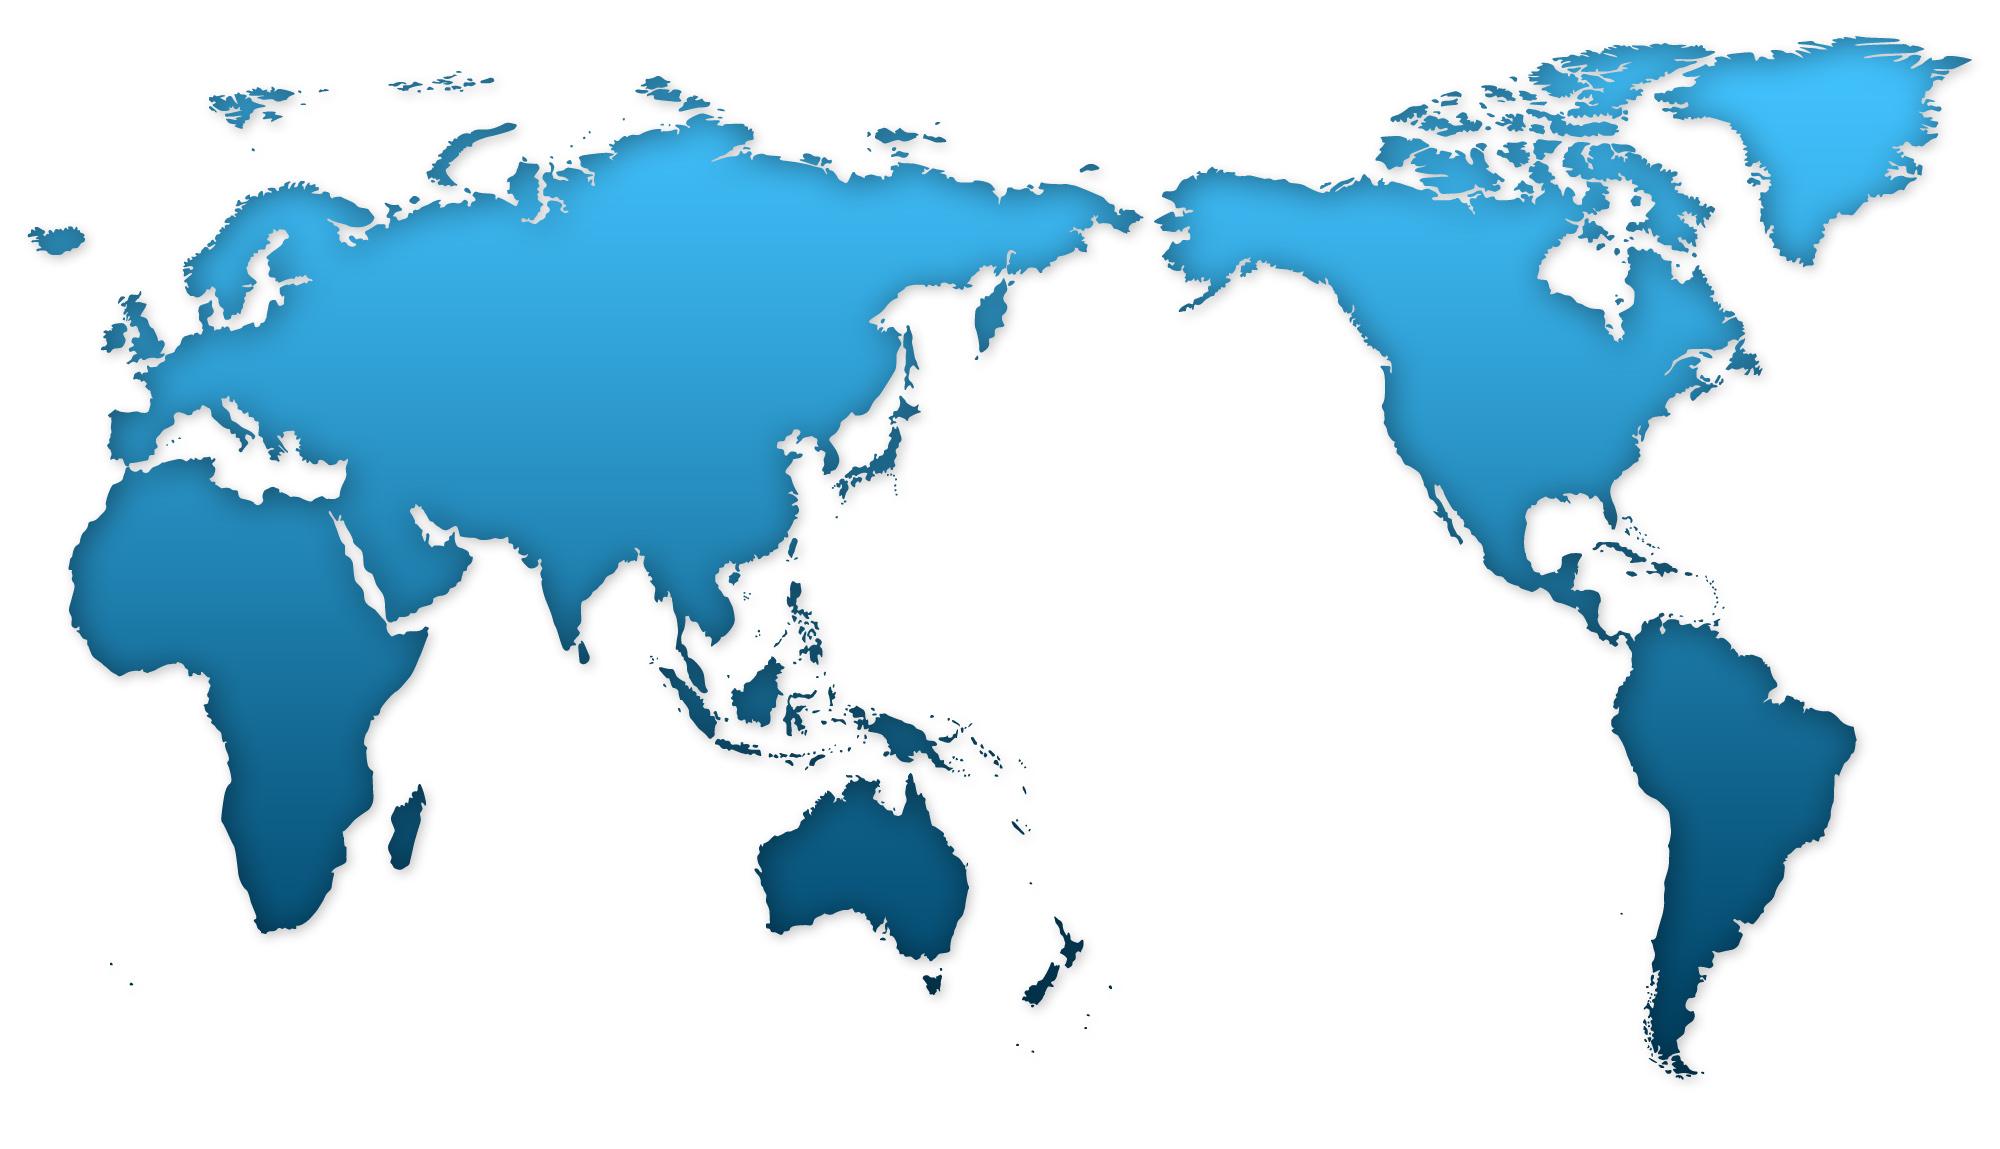 World_map_pics-3.jpg